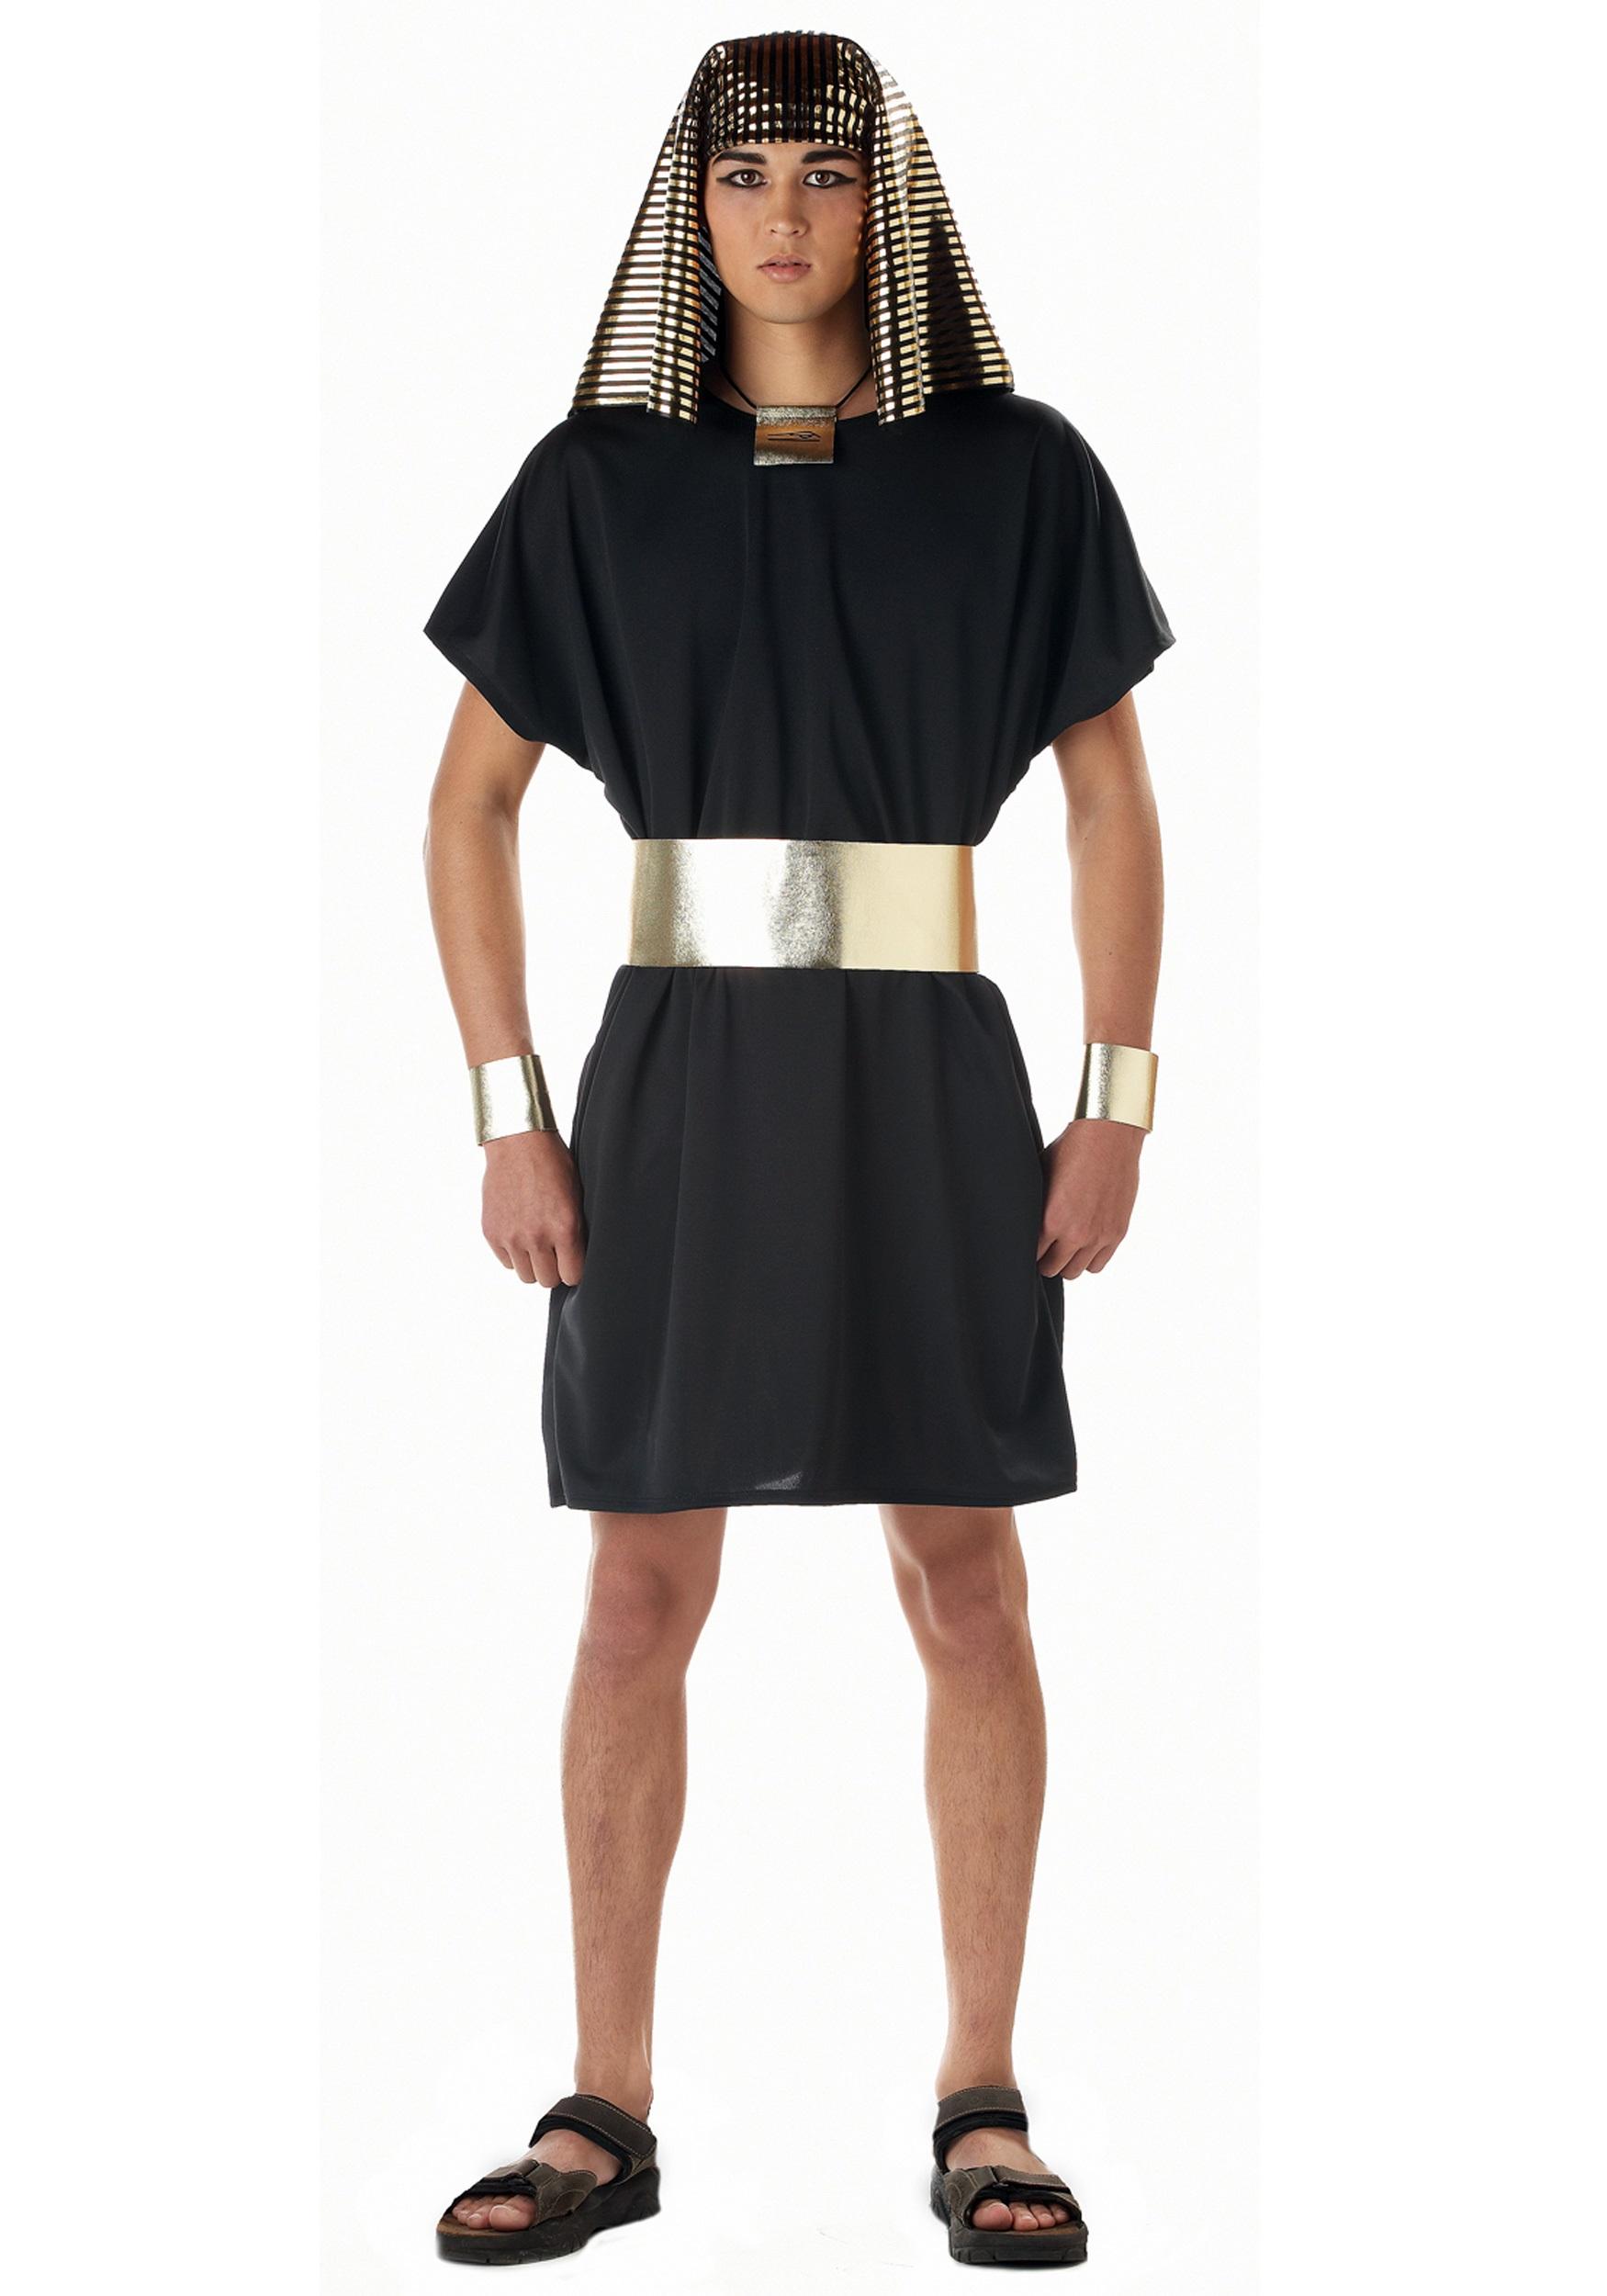 Adult Egyptian Costume 16